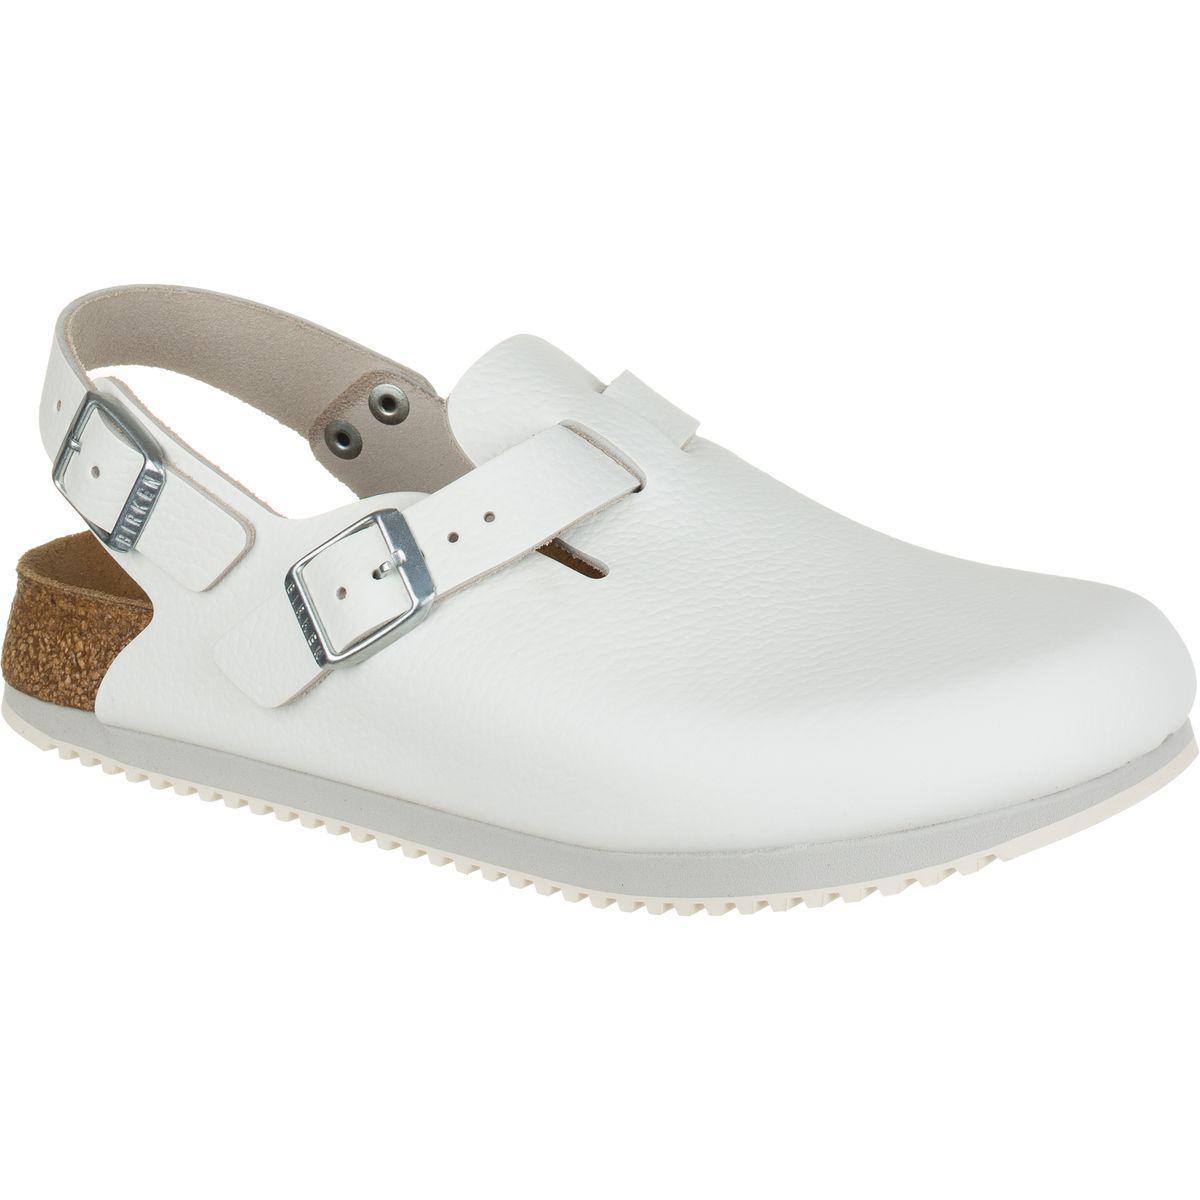 4ba0f77e3bf4 Lyst - Birkenstock Tokyo Super Grip Narrow Shoe in White